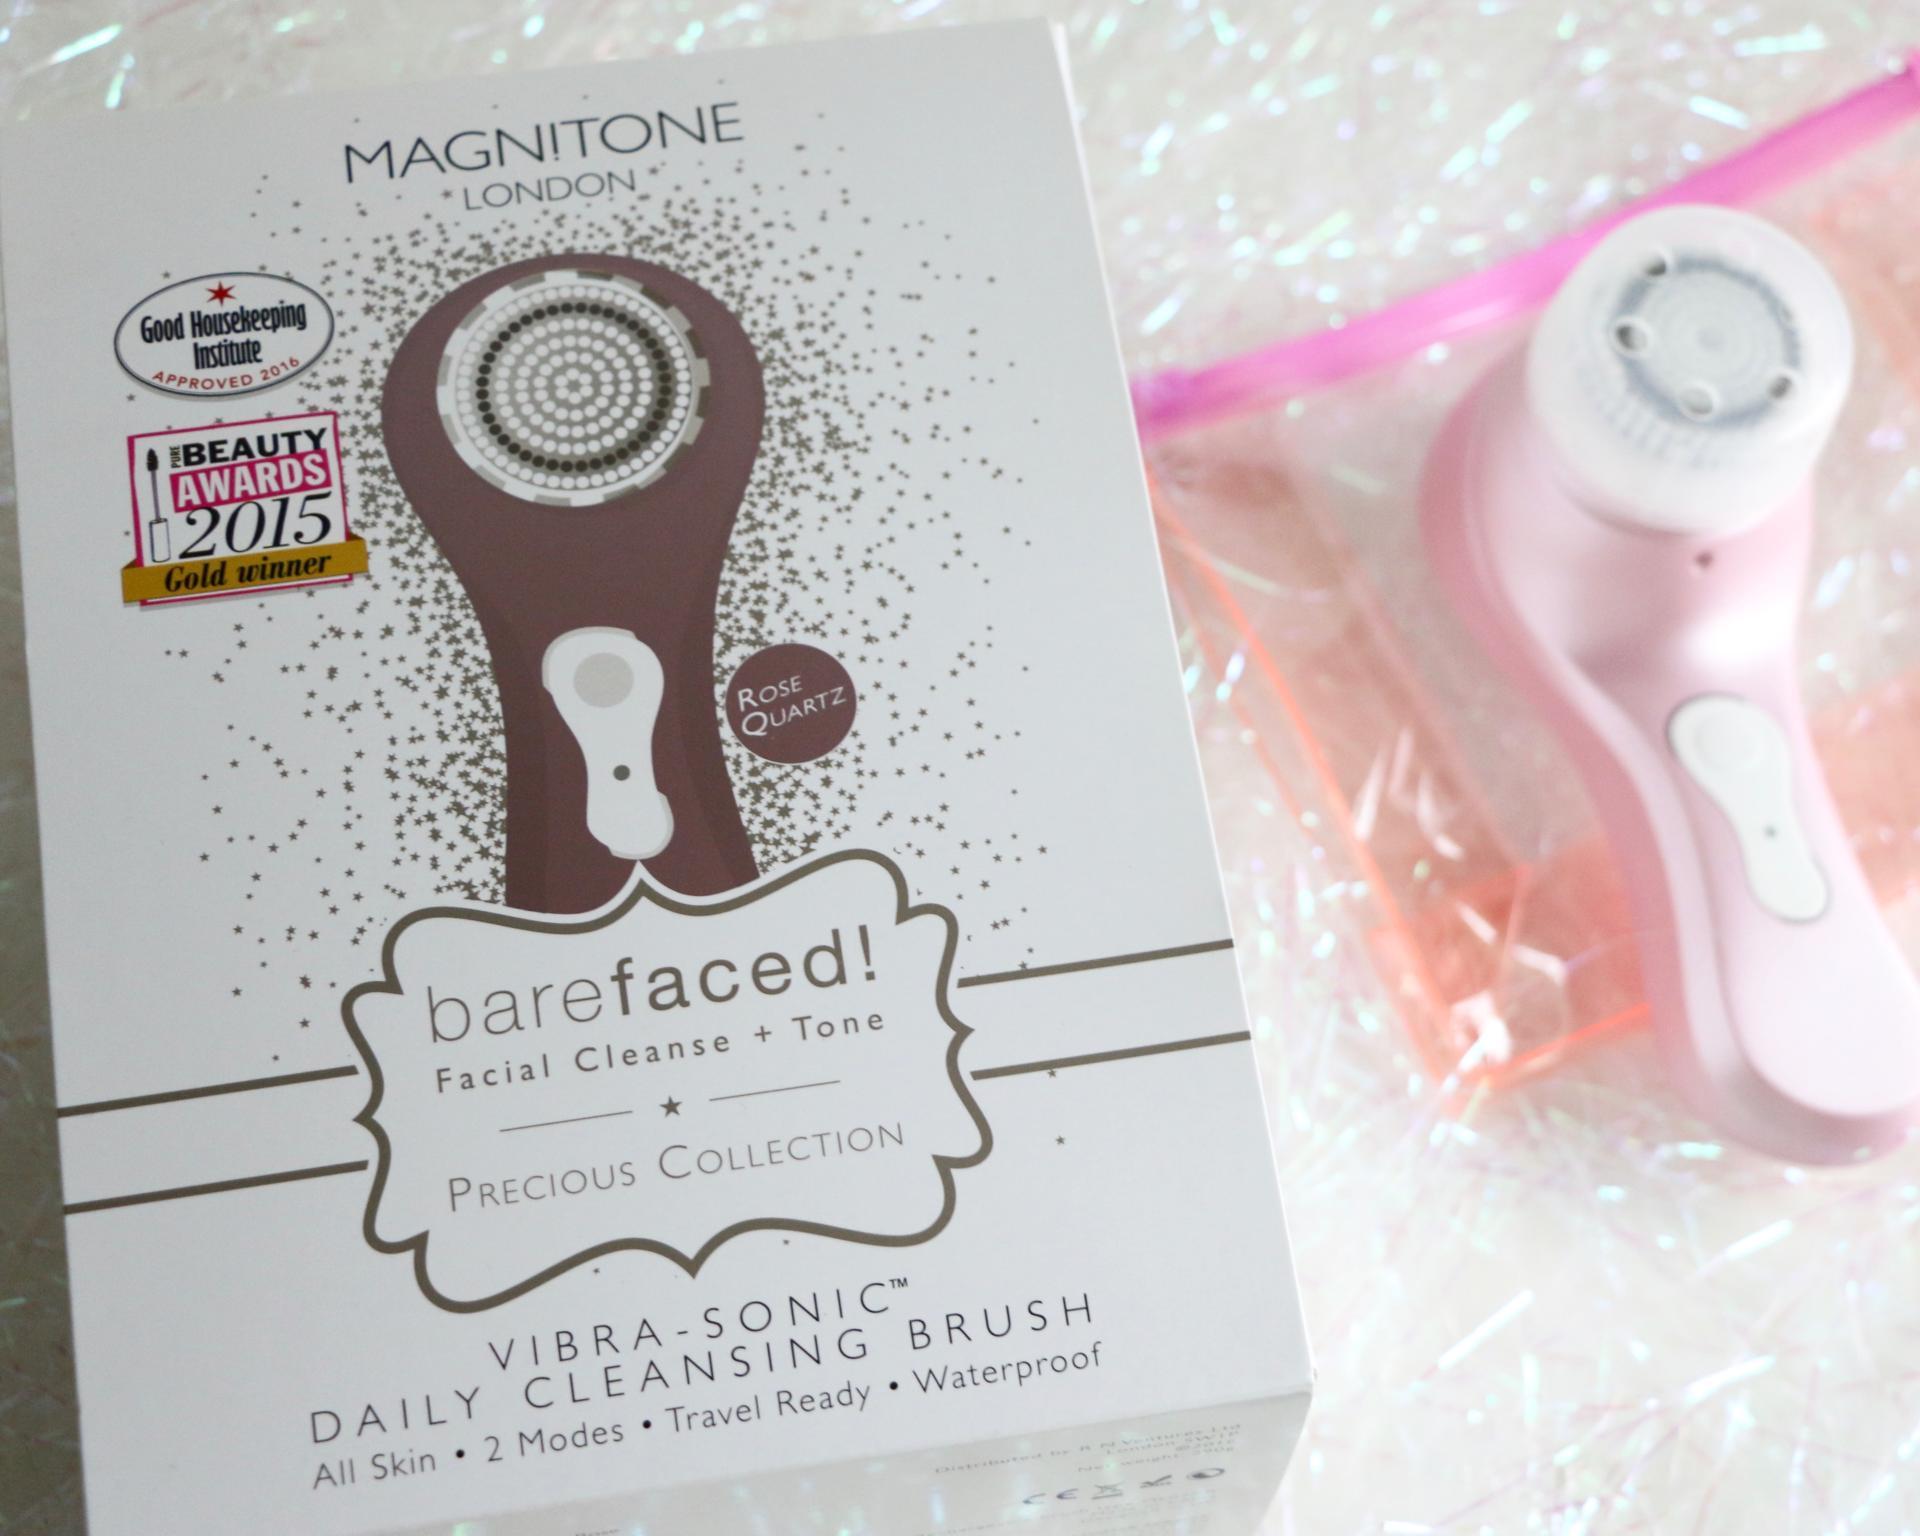 magnitone-barefaced-precious-collection-rose-quartz